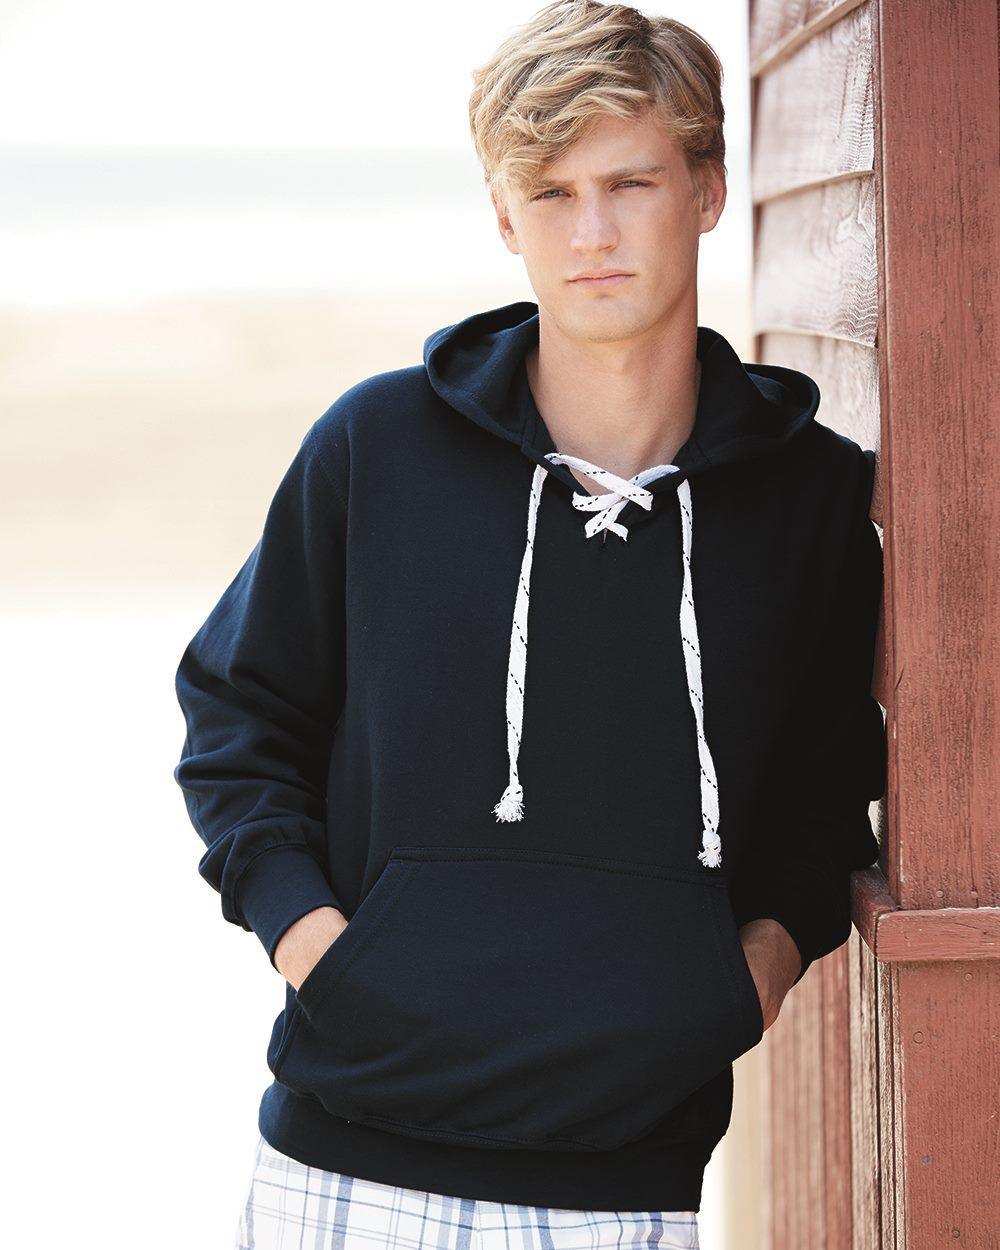 MV Sport 476 - Hooded Hockey Sweatshirt